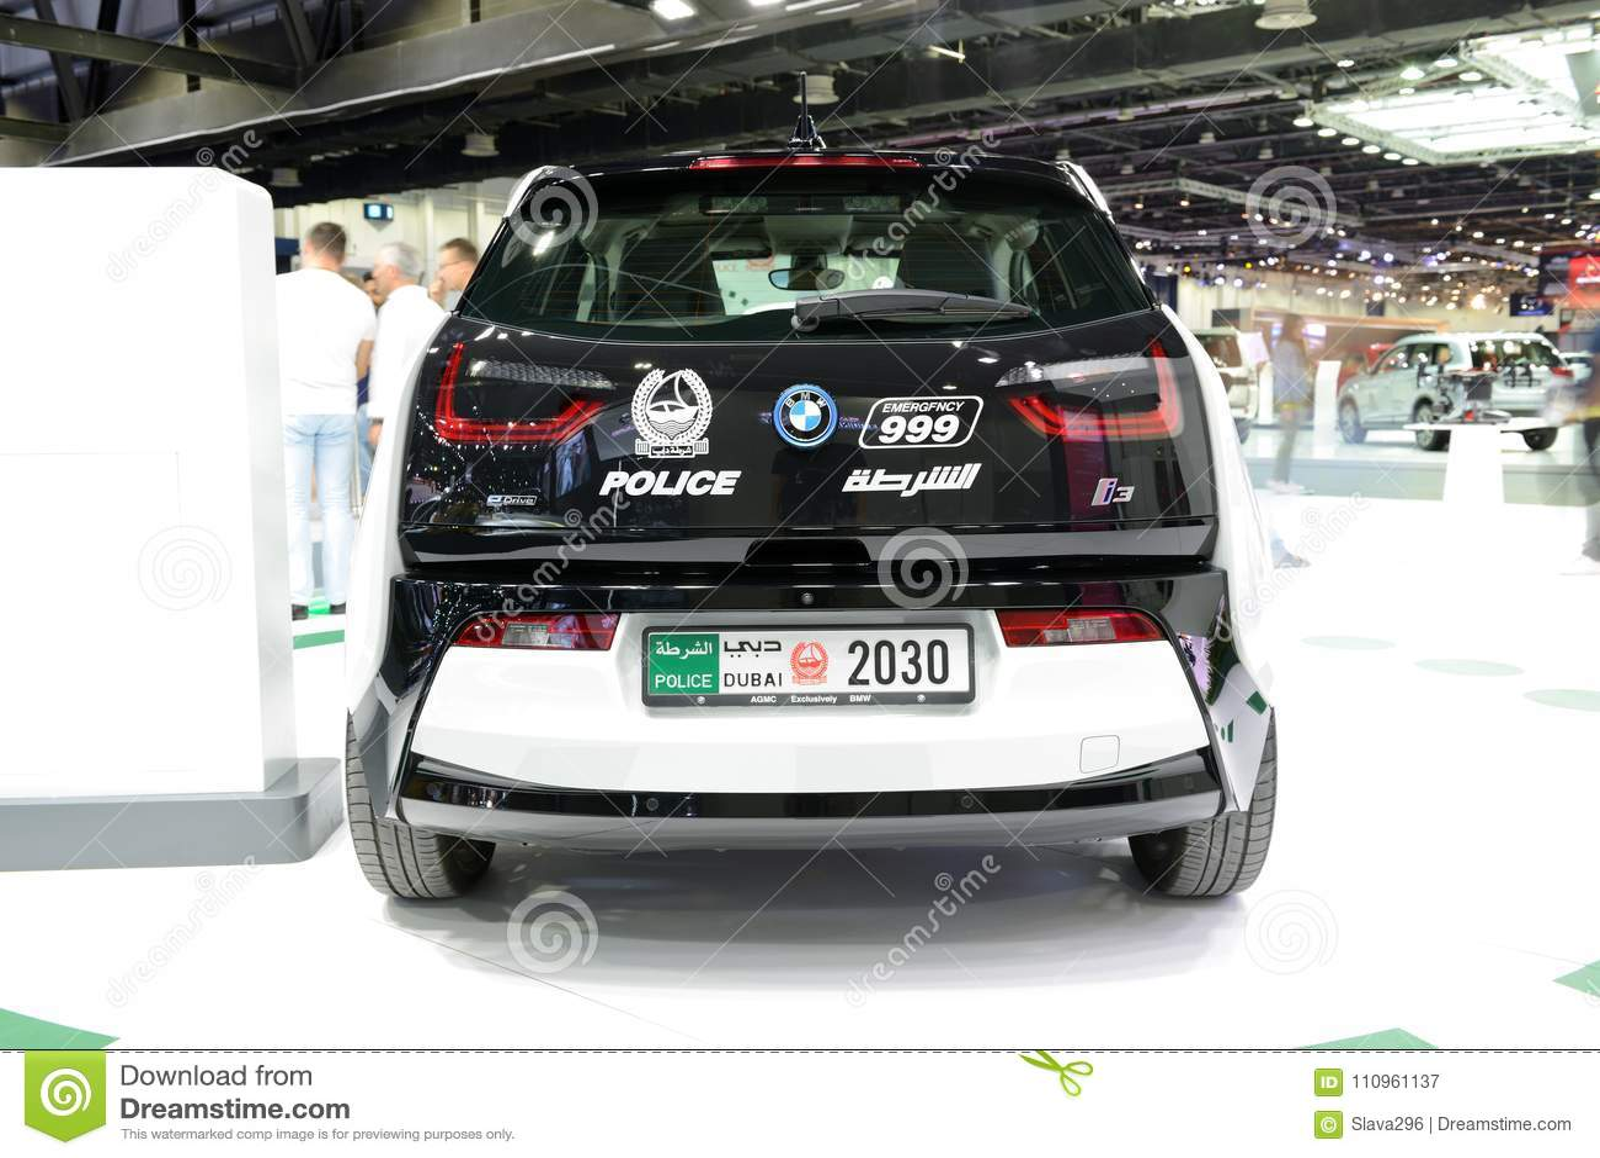 The Bmw I3 Of Dubai Police Electric Car Is On Dubai Motor Show 2017